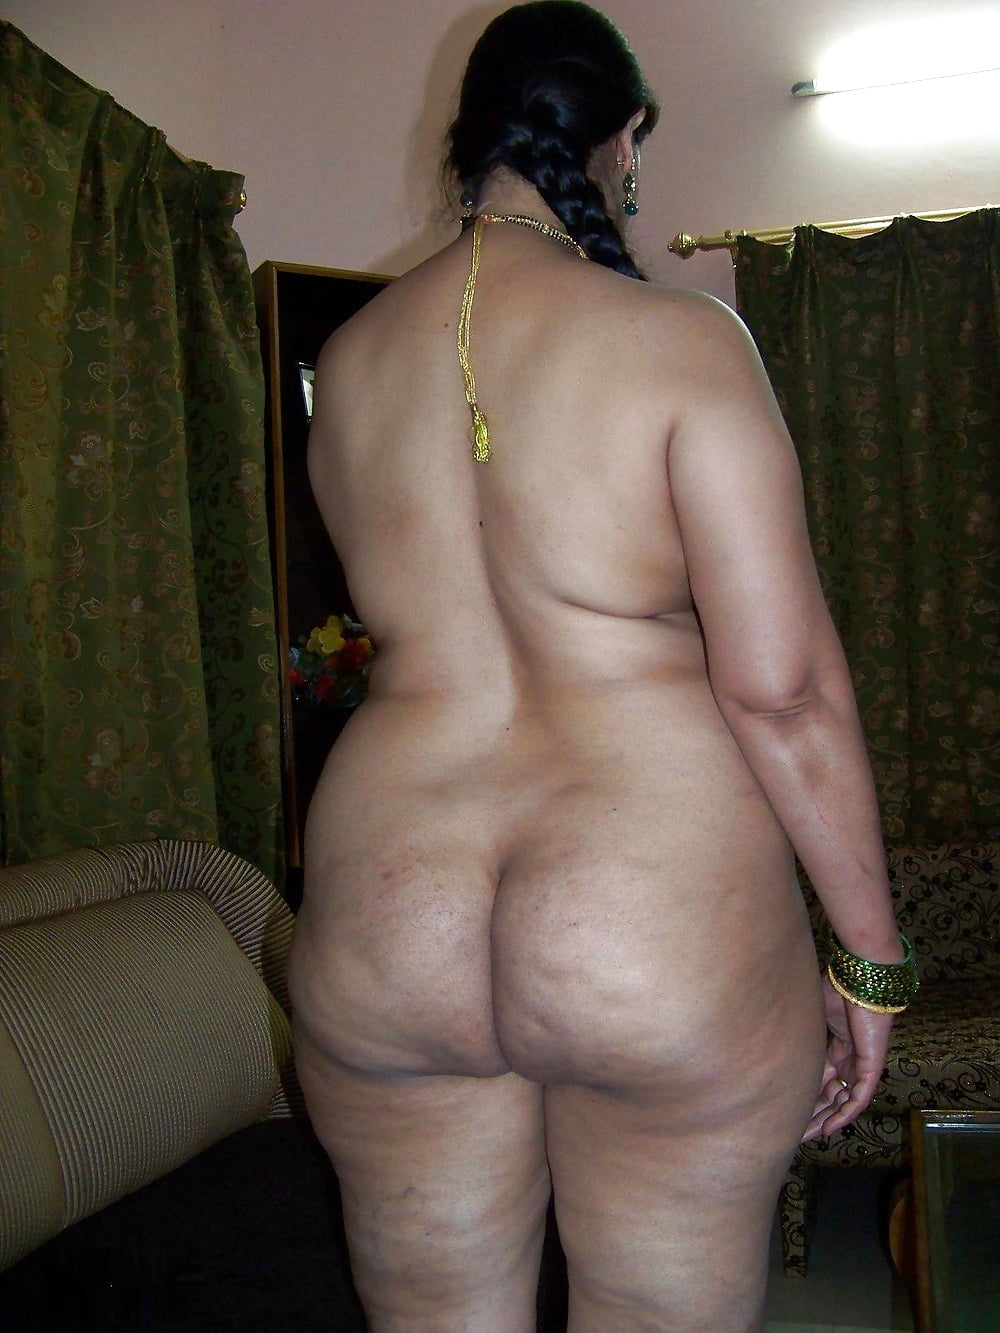 Desi fat ass erotic bhabhi hot photo